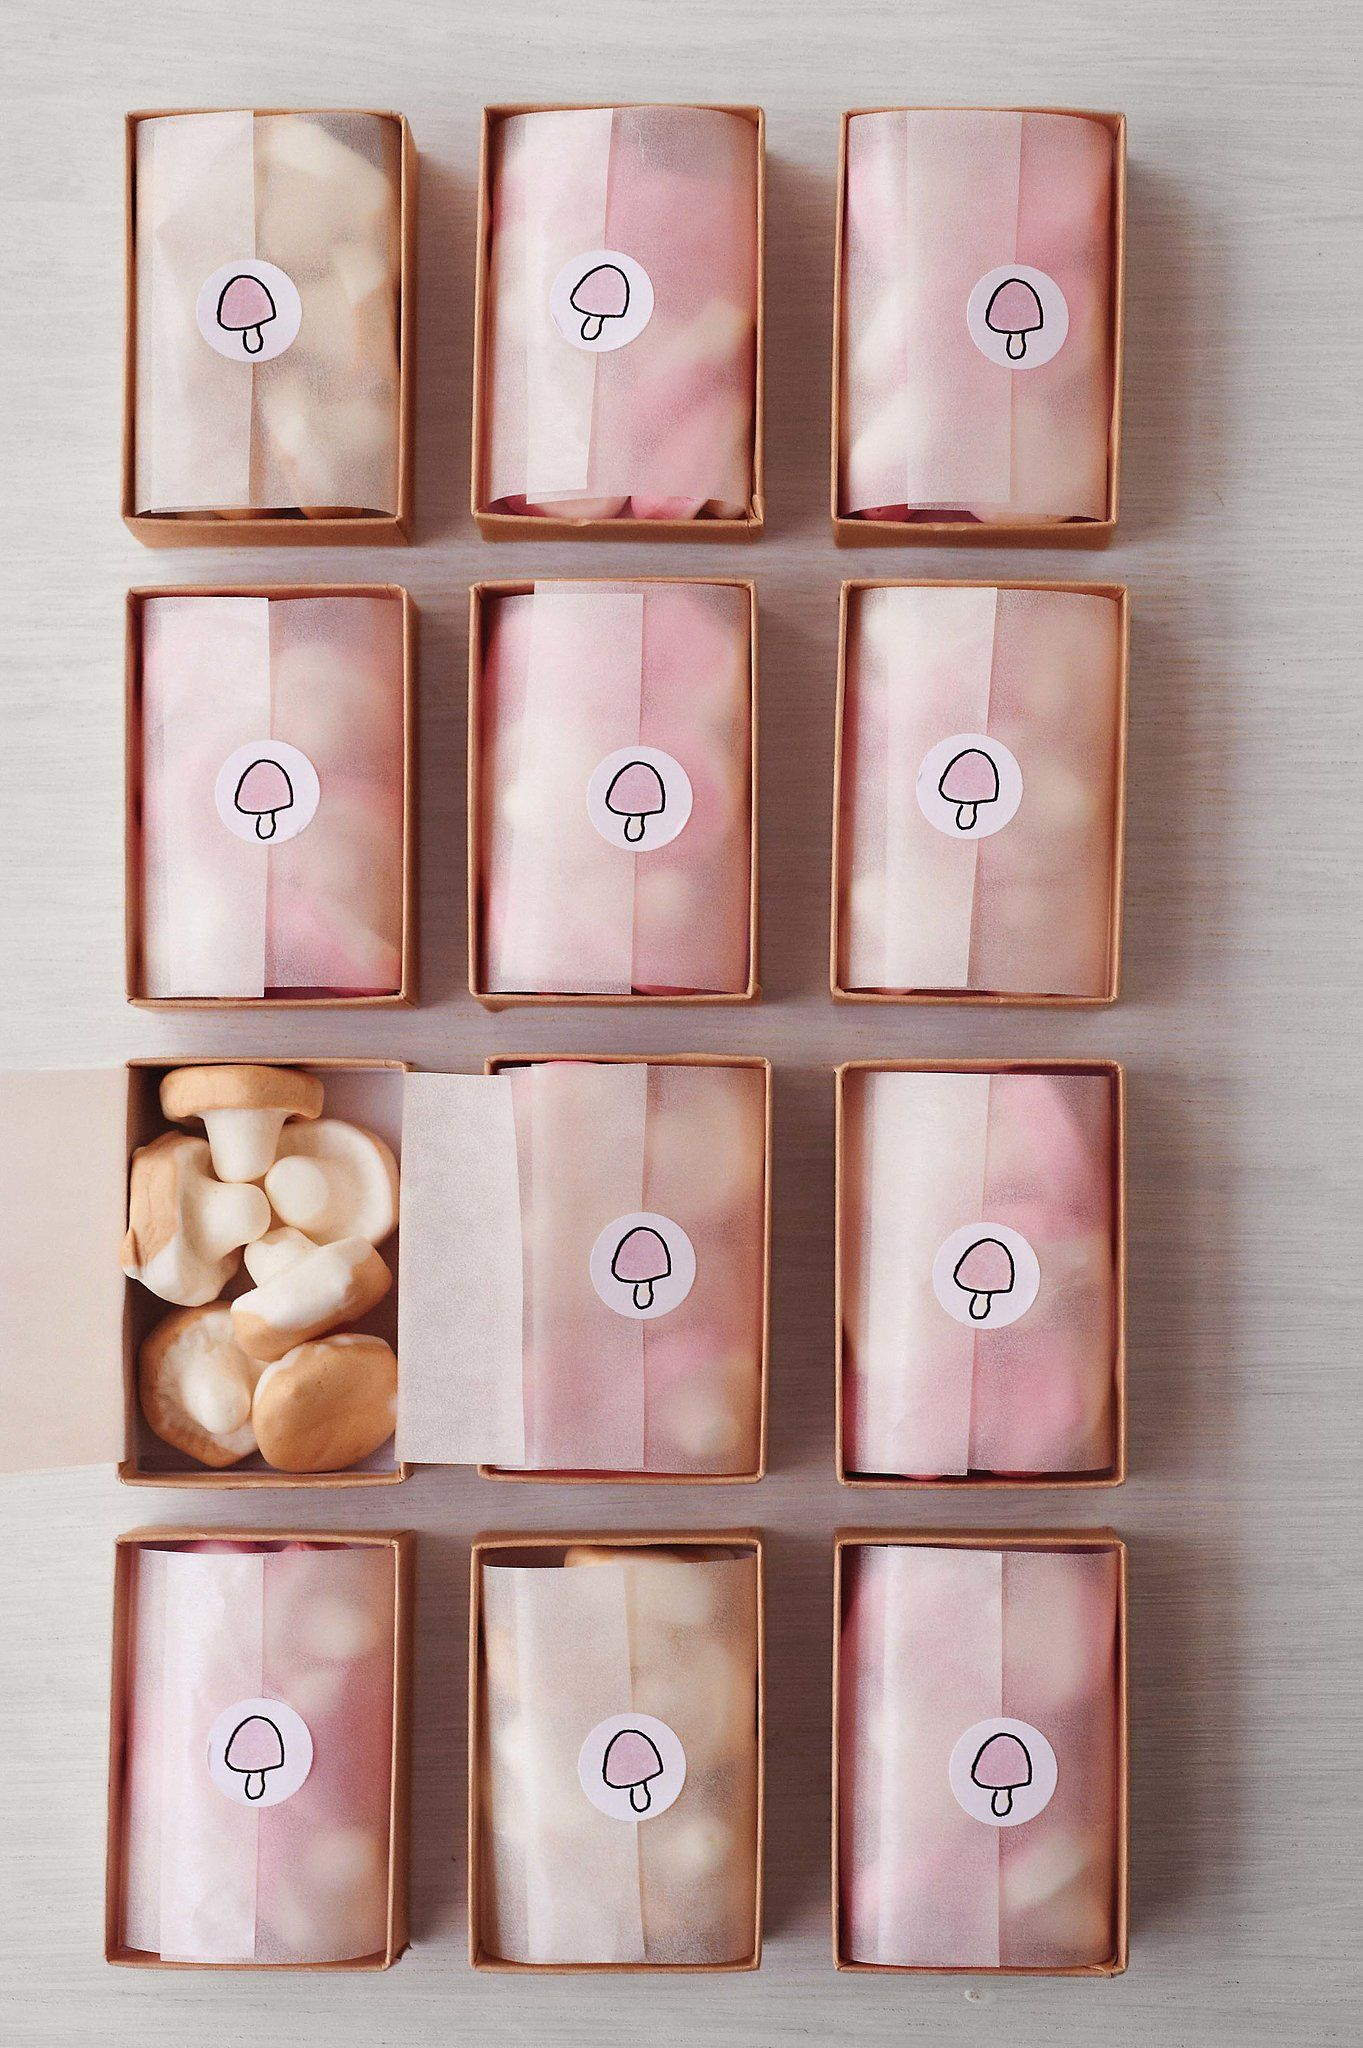 woodland fete.mushroom-shaped marshmallows were packaged up for guests./ metsä aiheisten juhien vieraslahjana sienikarkkeja